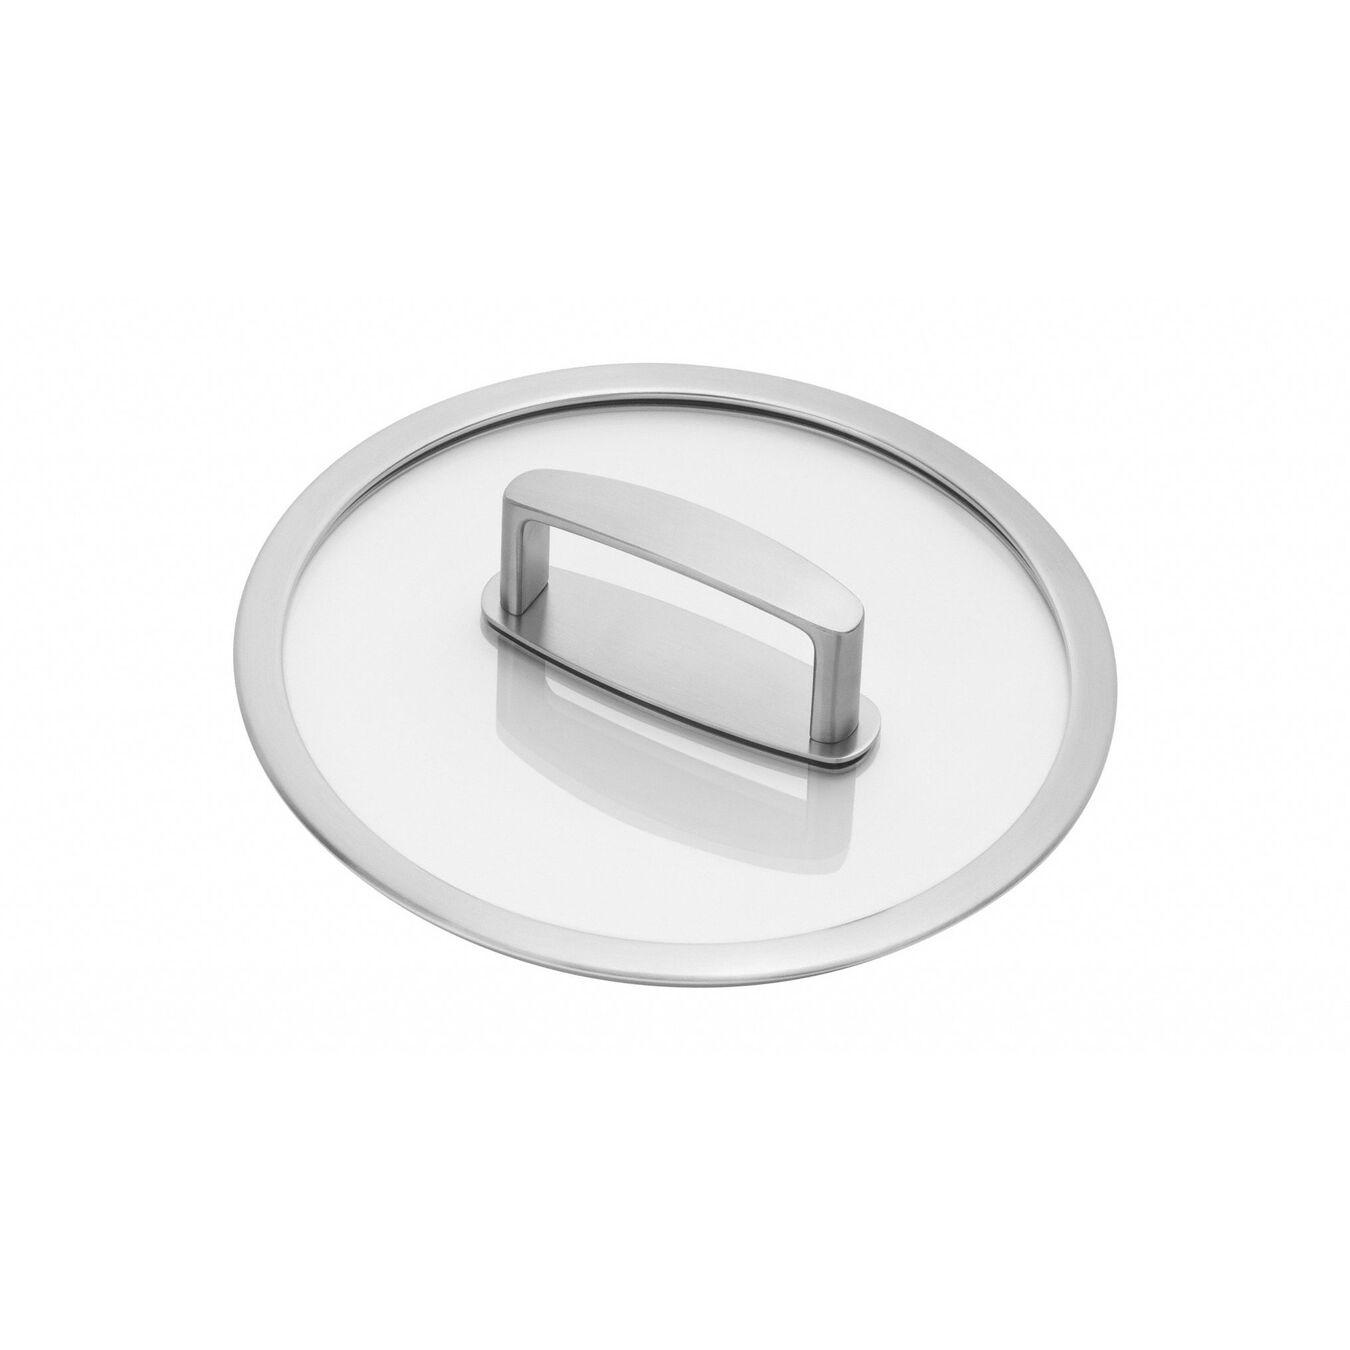 Tencere Seti | 18/10 Paslanmaz Çelik | 5-adet,,large 12